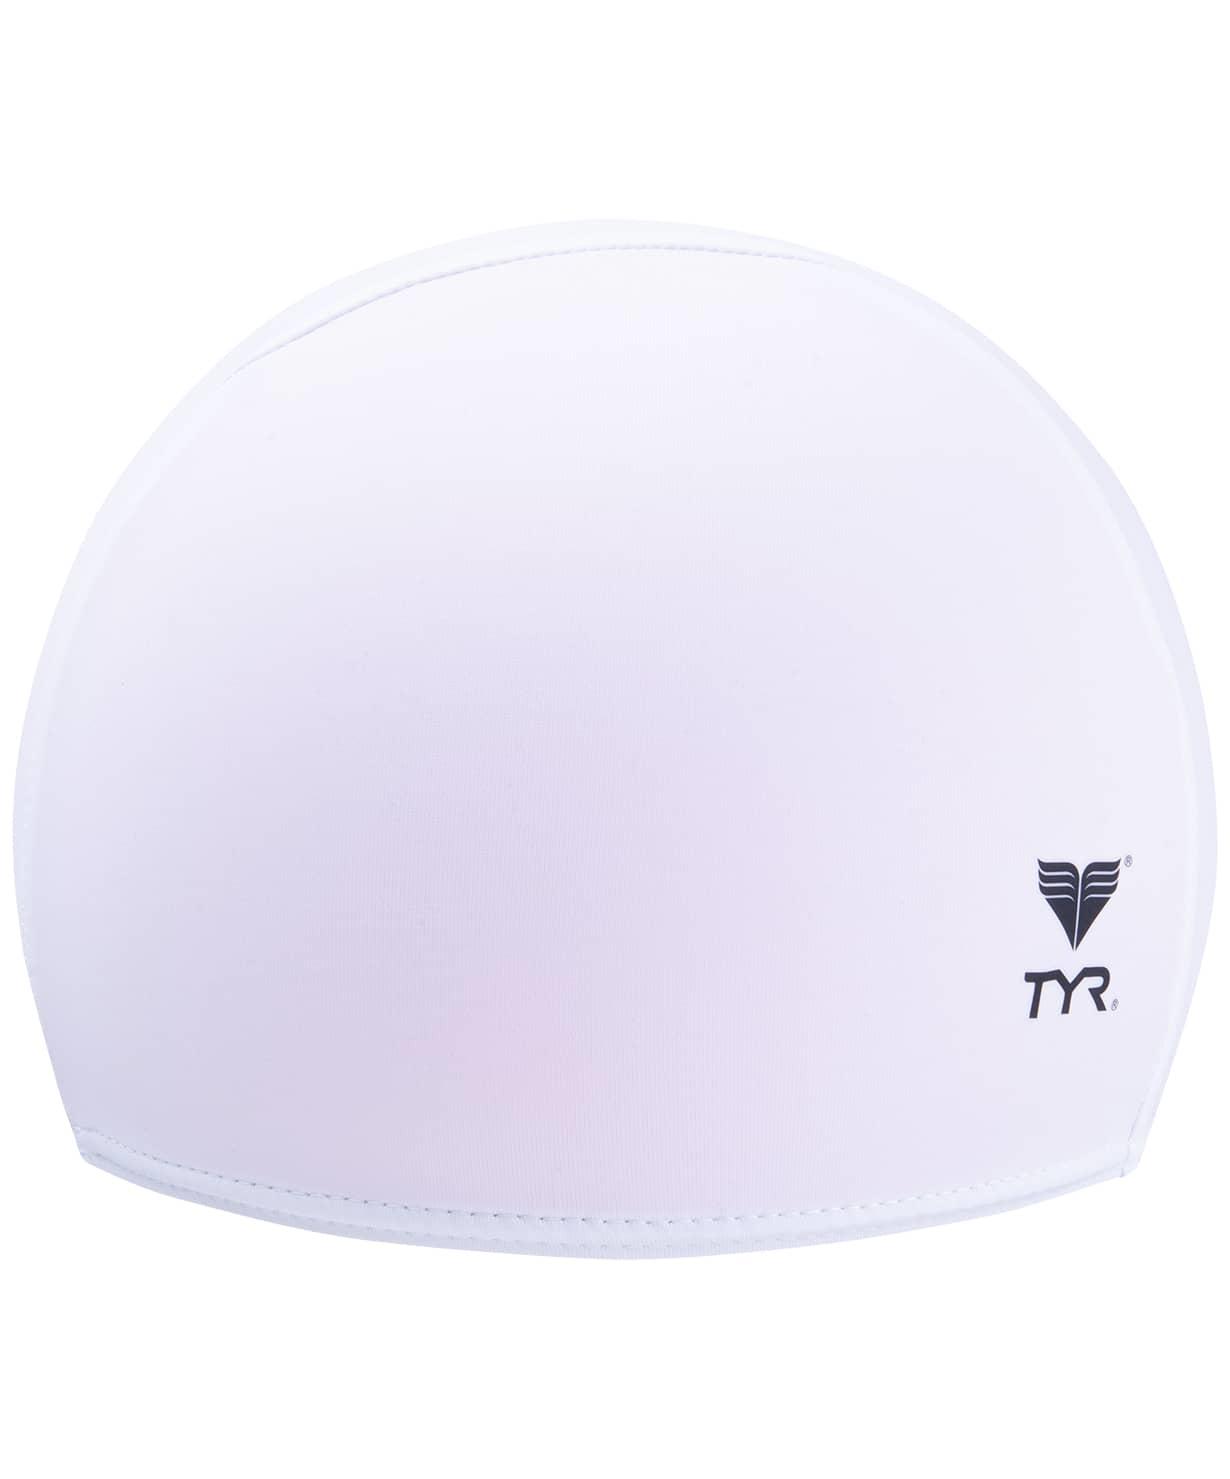 Шапочка для плавания Solid Lycra Cap LCY/100, лайкра, белый